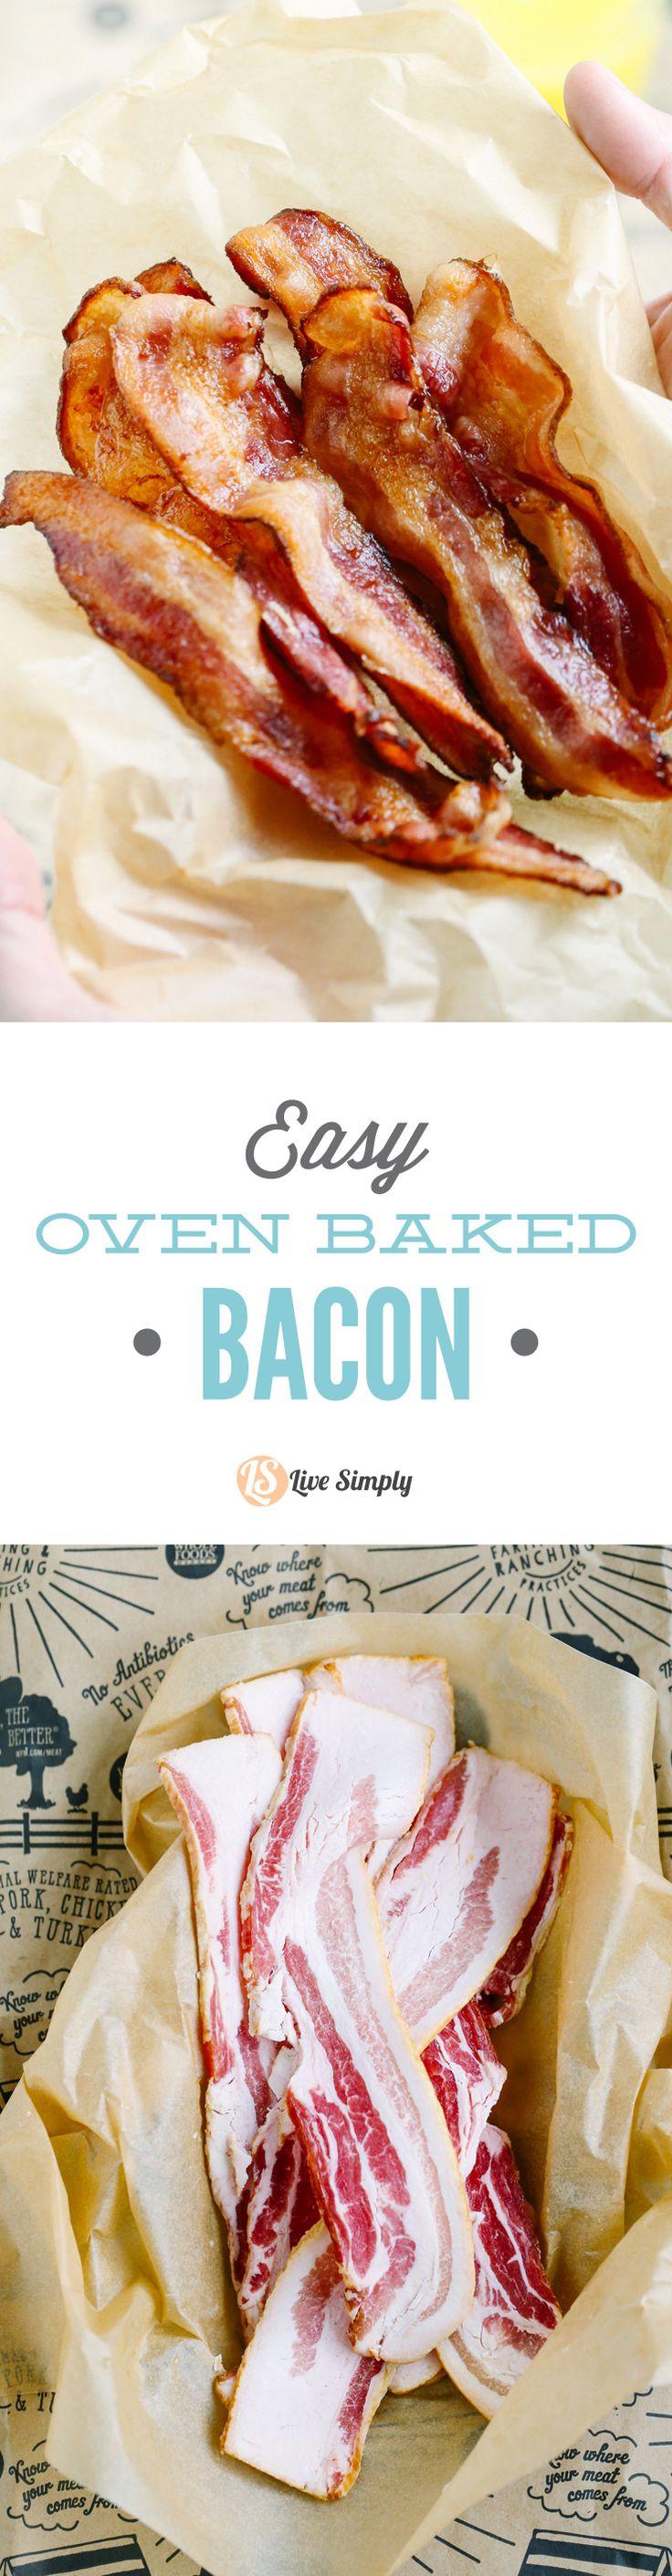 Ovenbaked Bacon